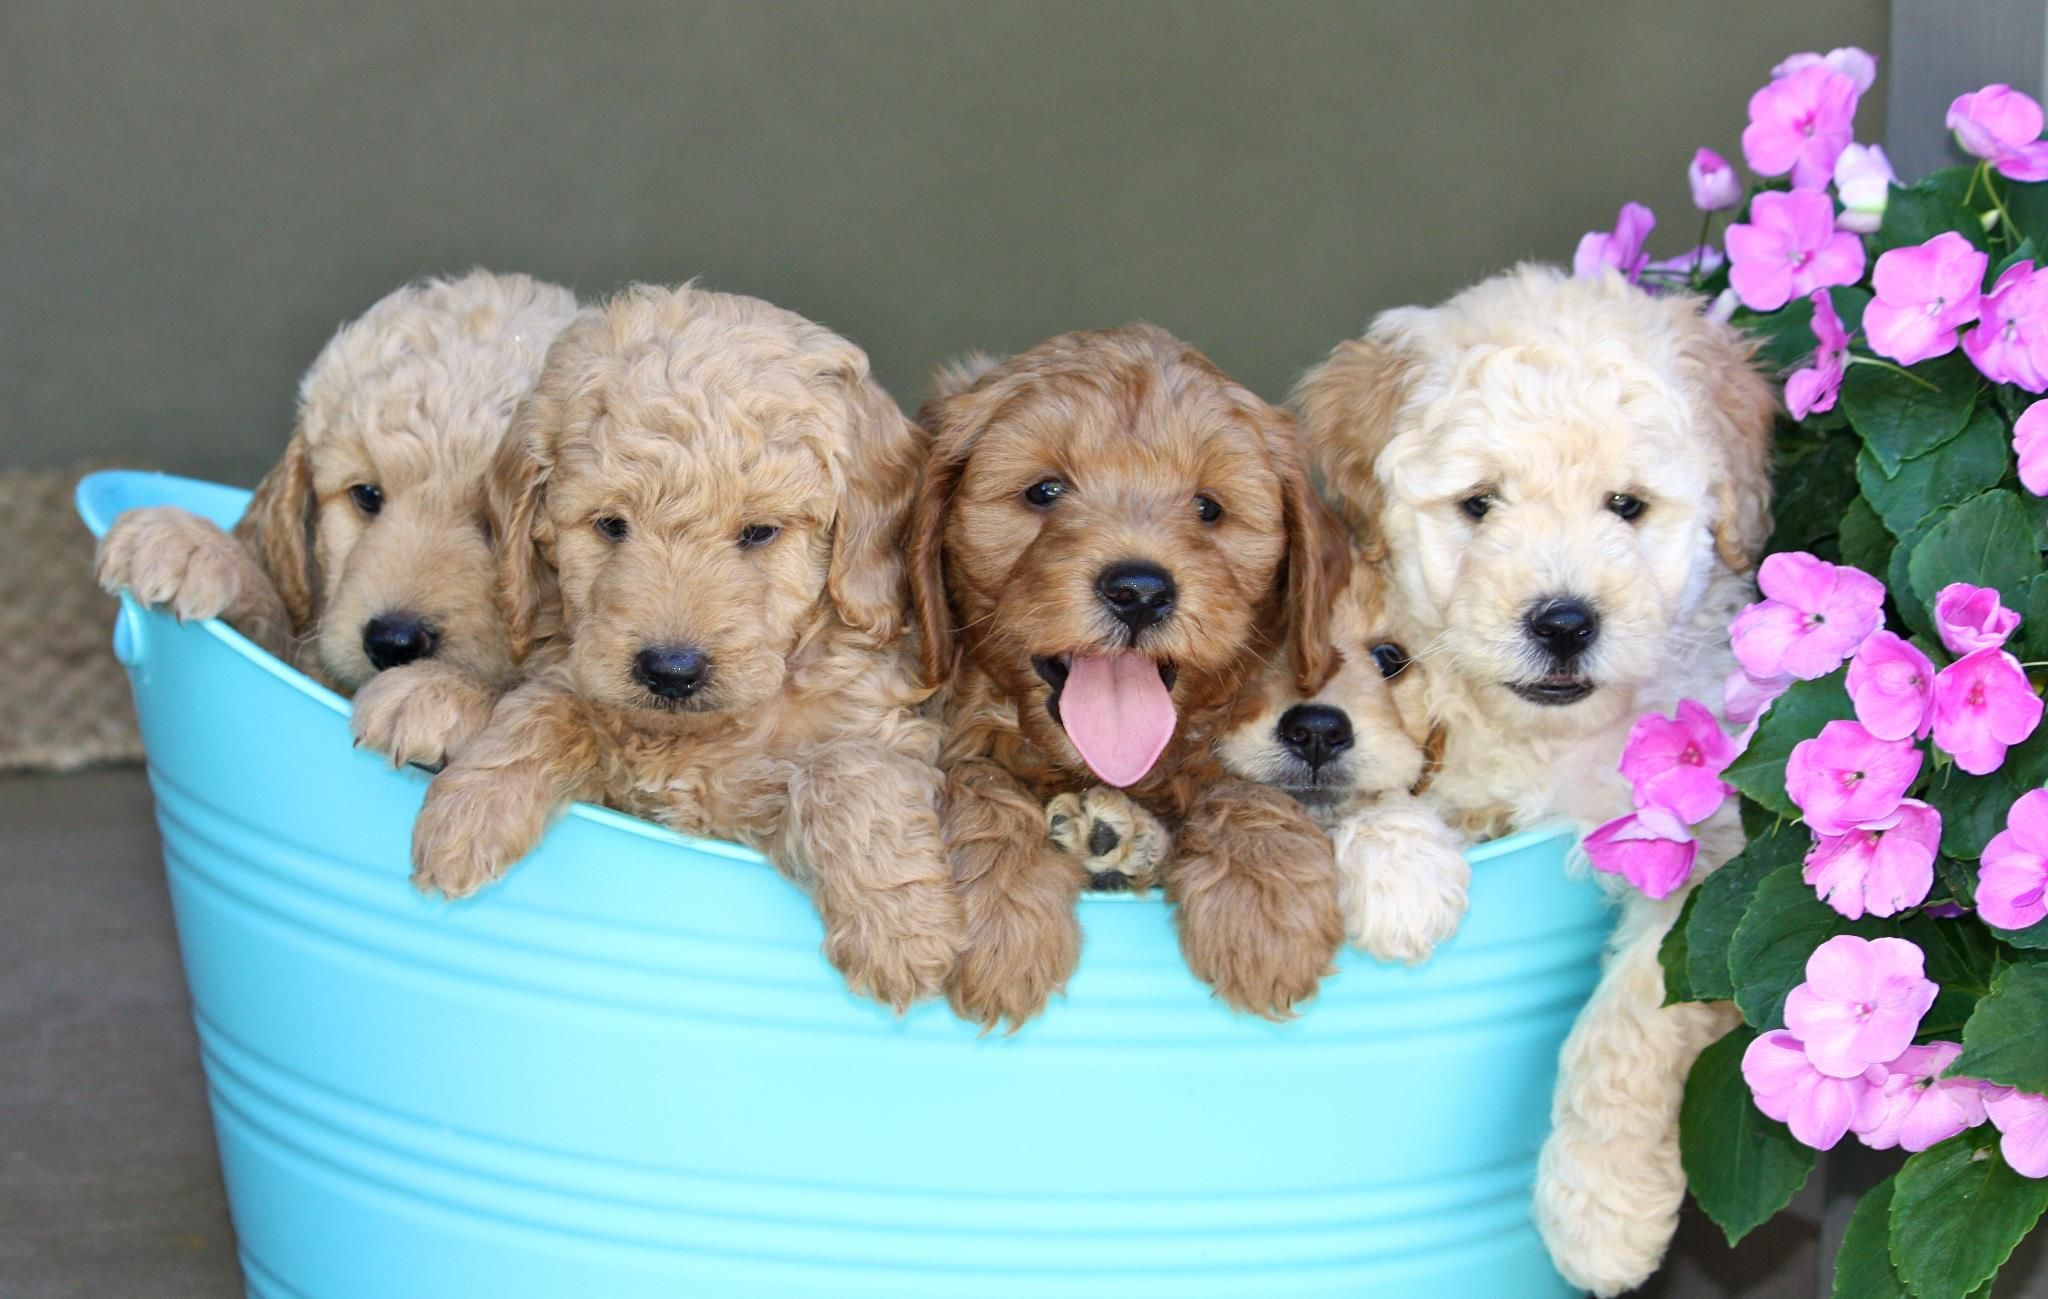 Almond Blossom Doodles Goldendoodles San Francisco Area California Mini Labradoodle Puppy Mini Goldendoodle Puppies Labradoodle Puppies For Sale